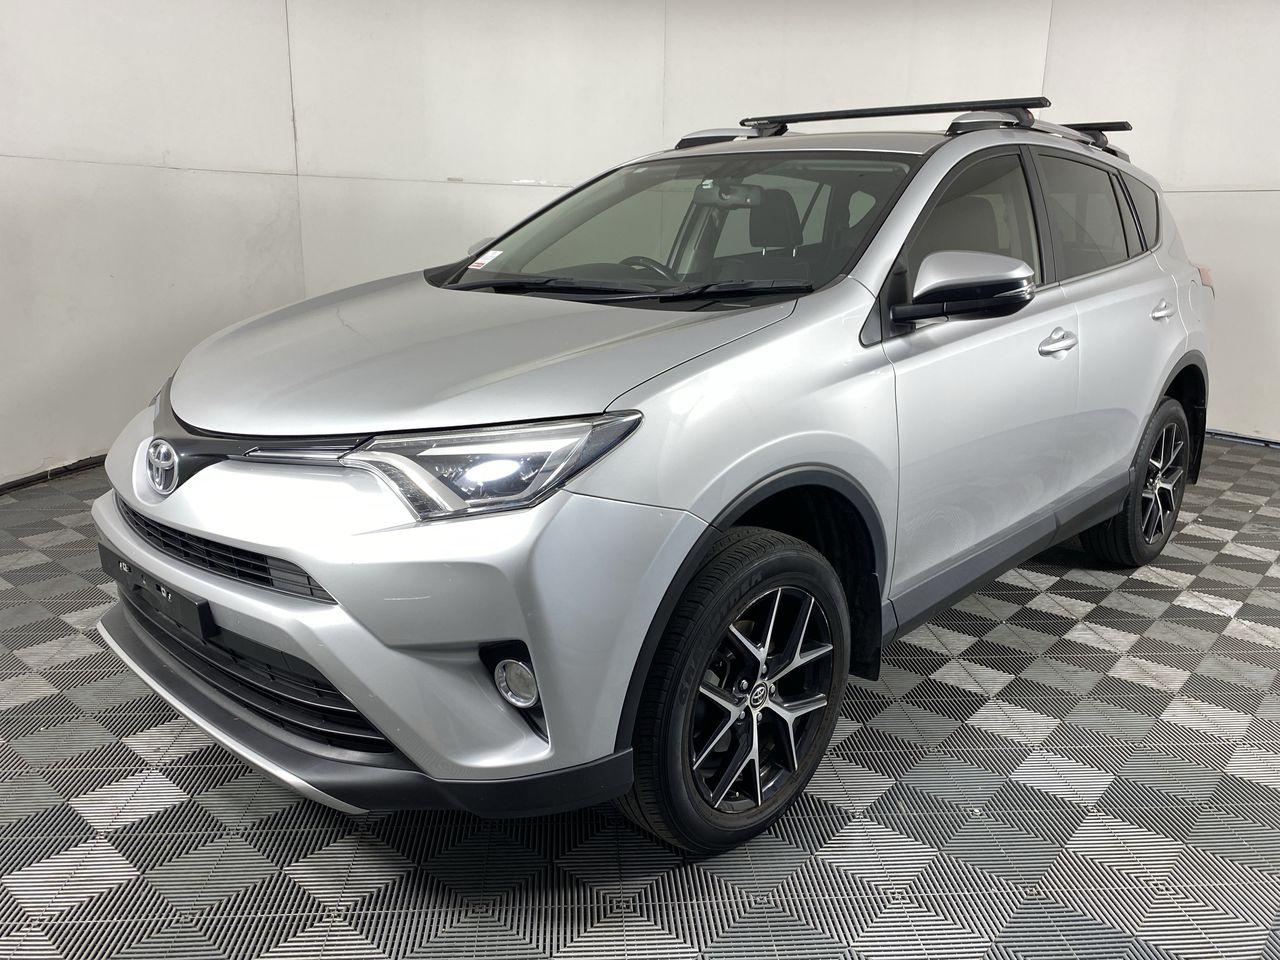 2016 Toyota Rav 4 GXL ZSA42R Automatic Wagon 109,432km